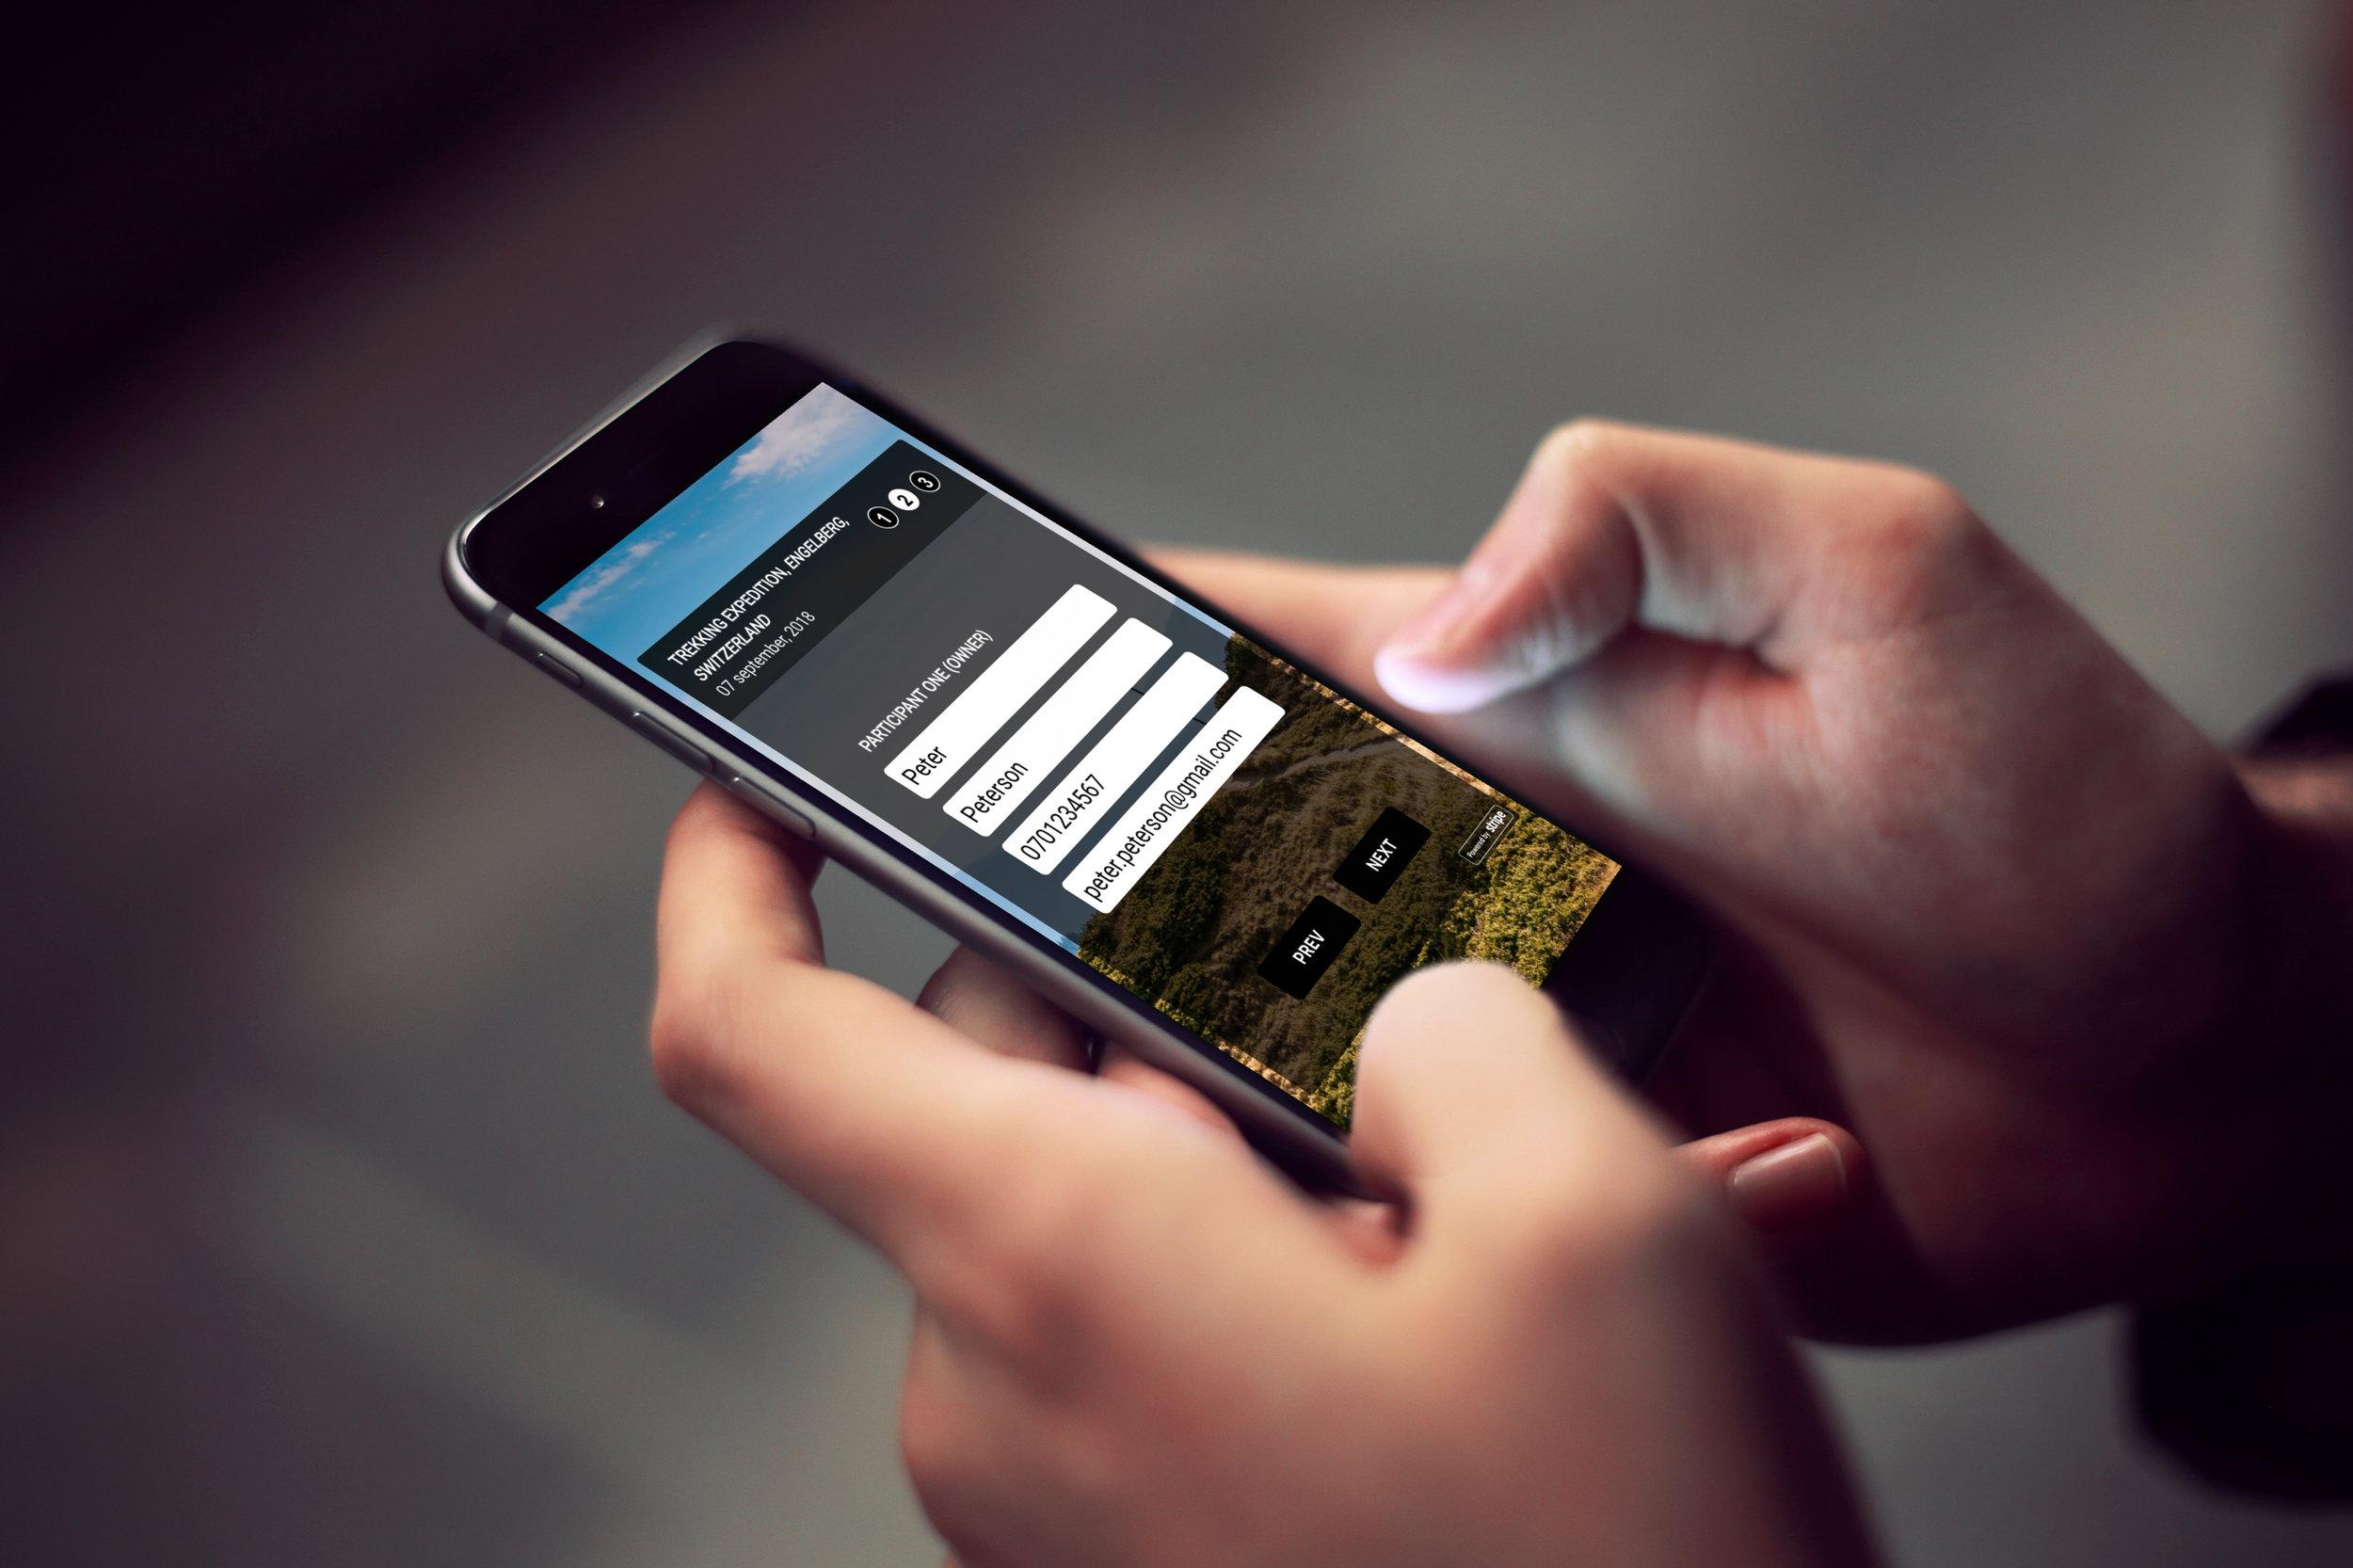 2 typing-on-iphone-6-in-the-underground.jpg